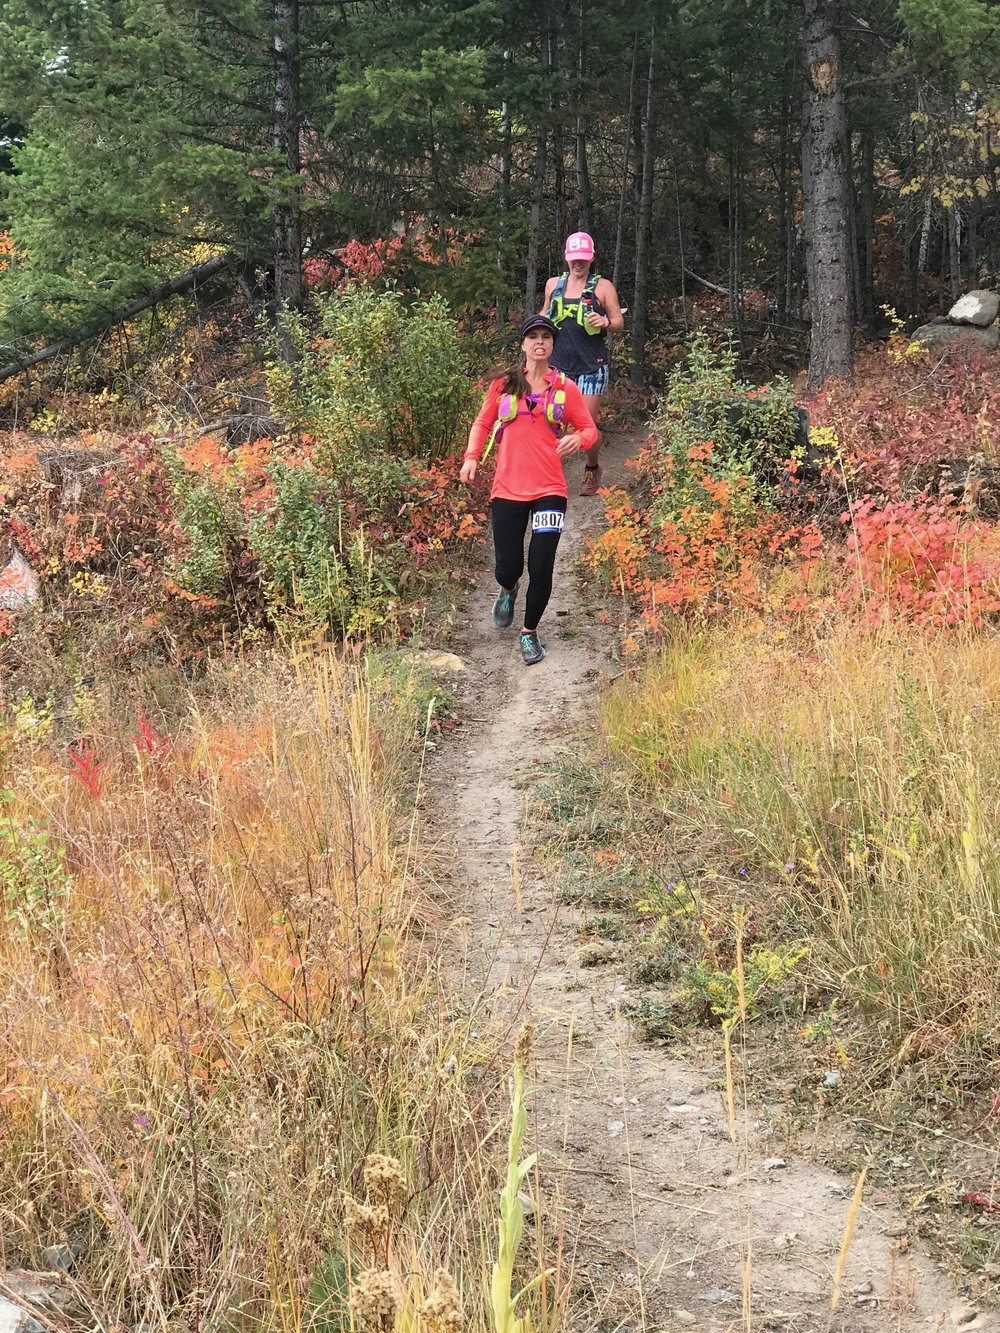 foys to blacktail trails trail marathon ftbtIMG_1760.JPG